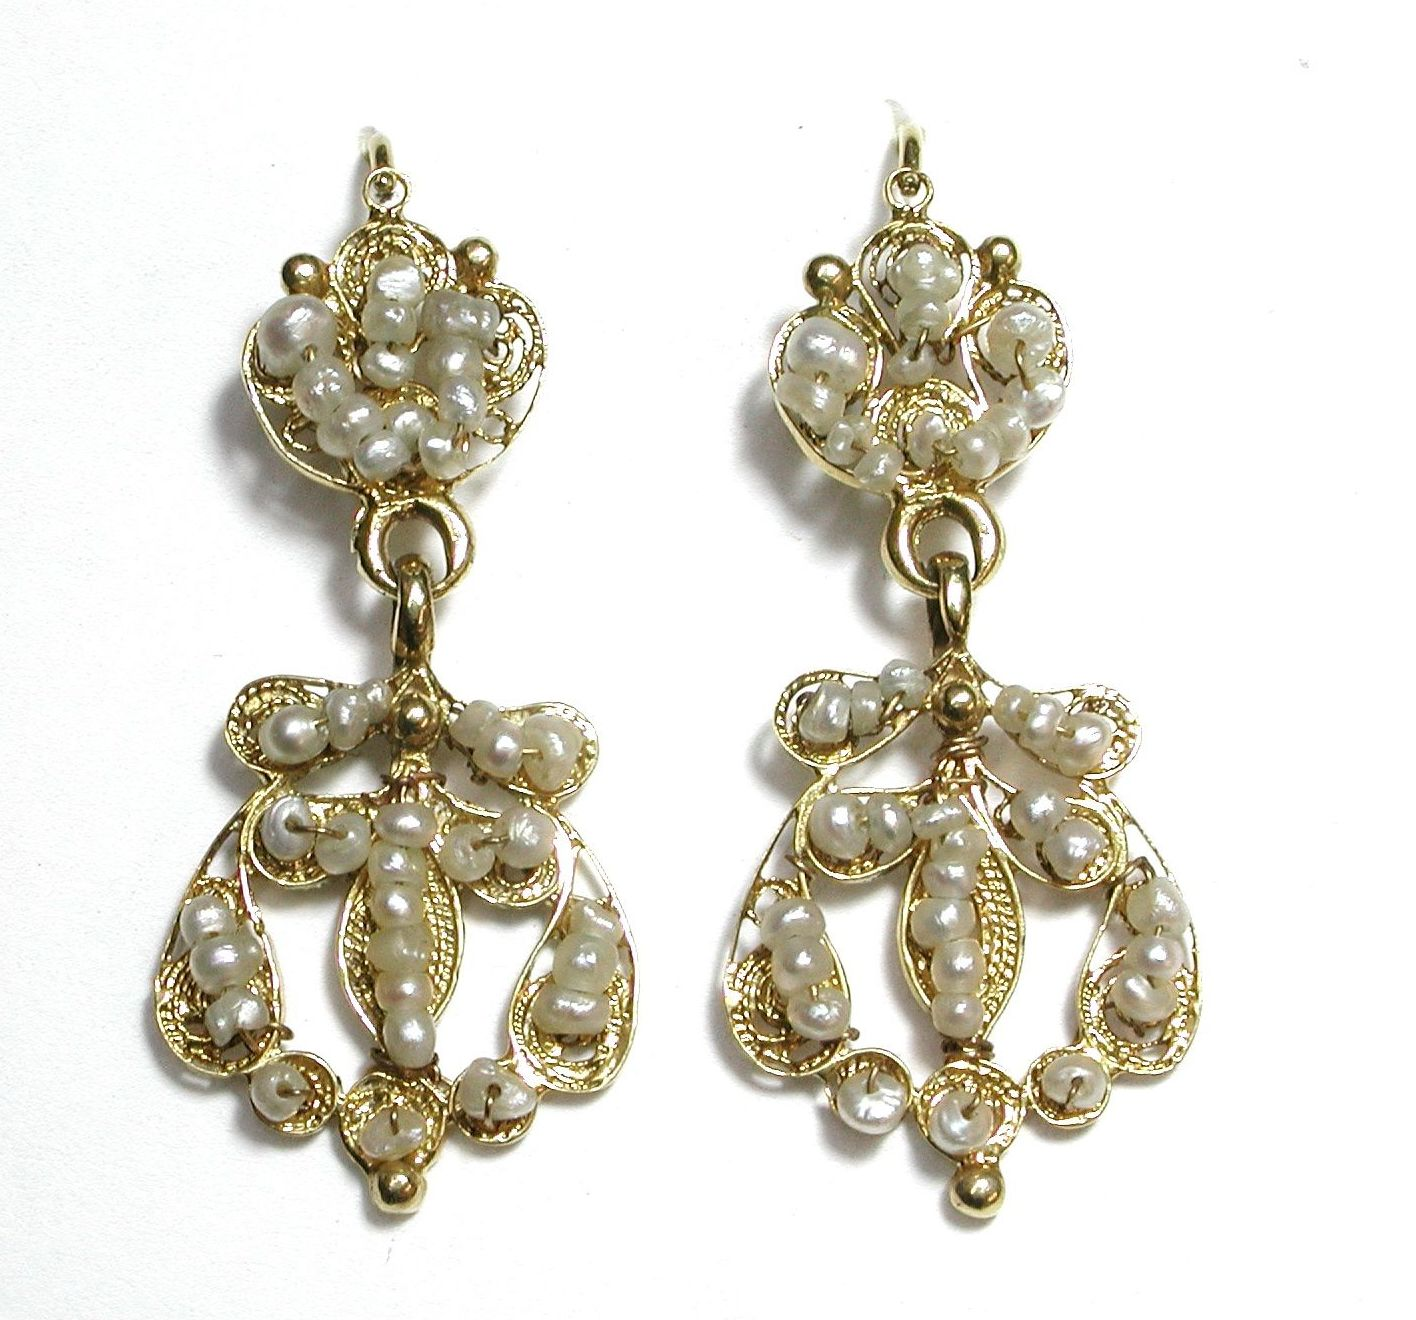 Pendientes de oro de 18k con perlas aljófar. S. XIX.: Catálogo de Antigua Joyeros